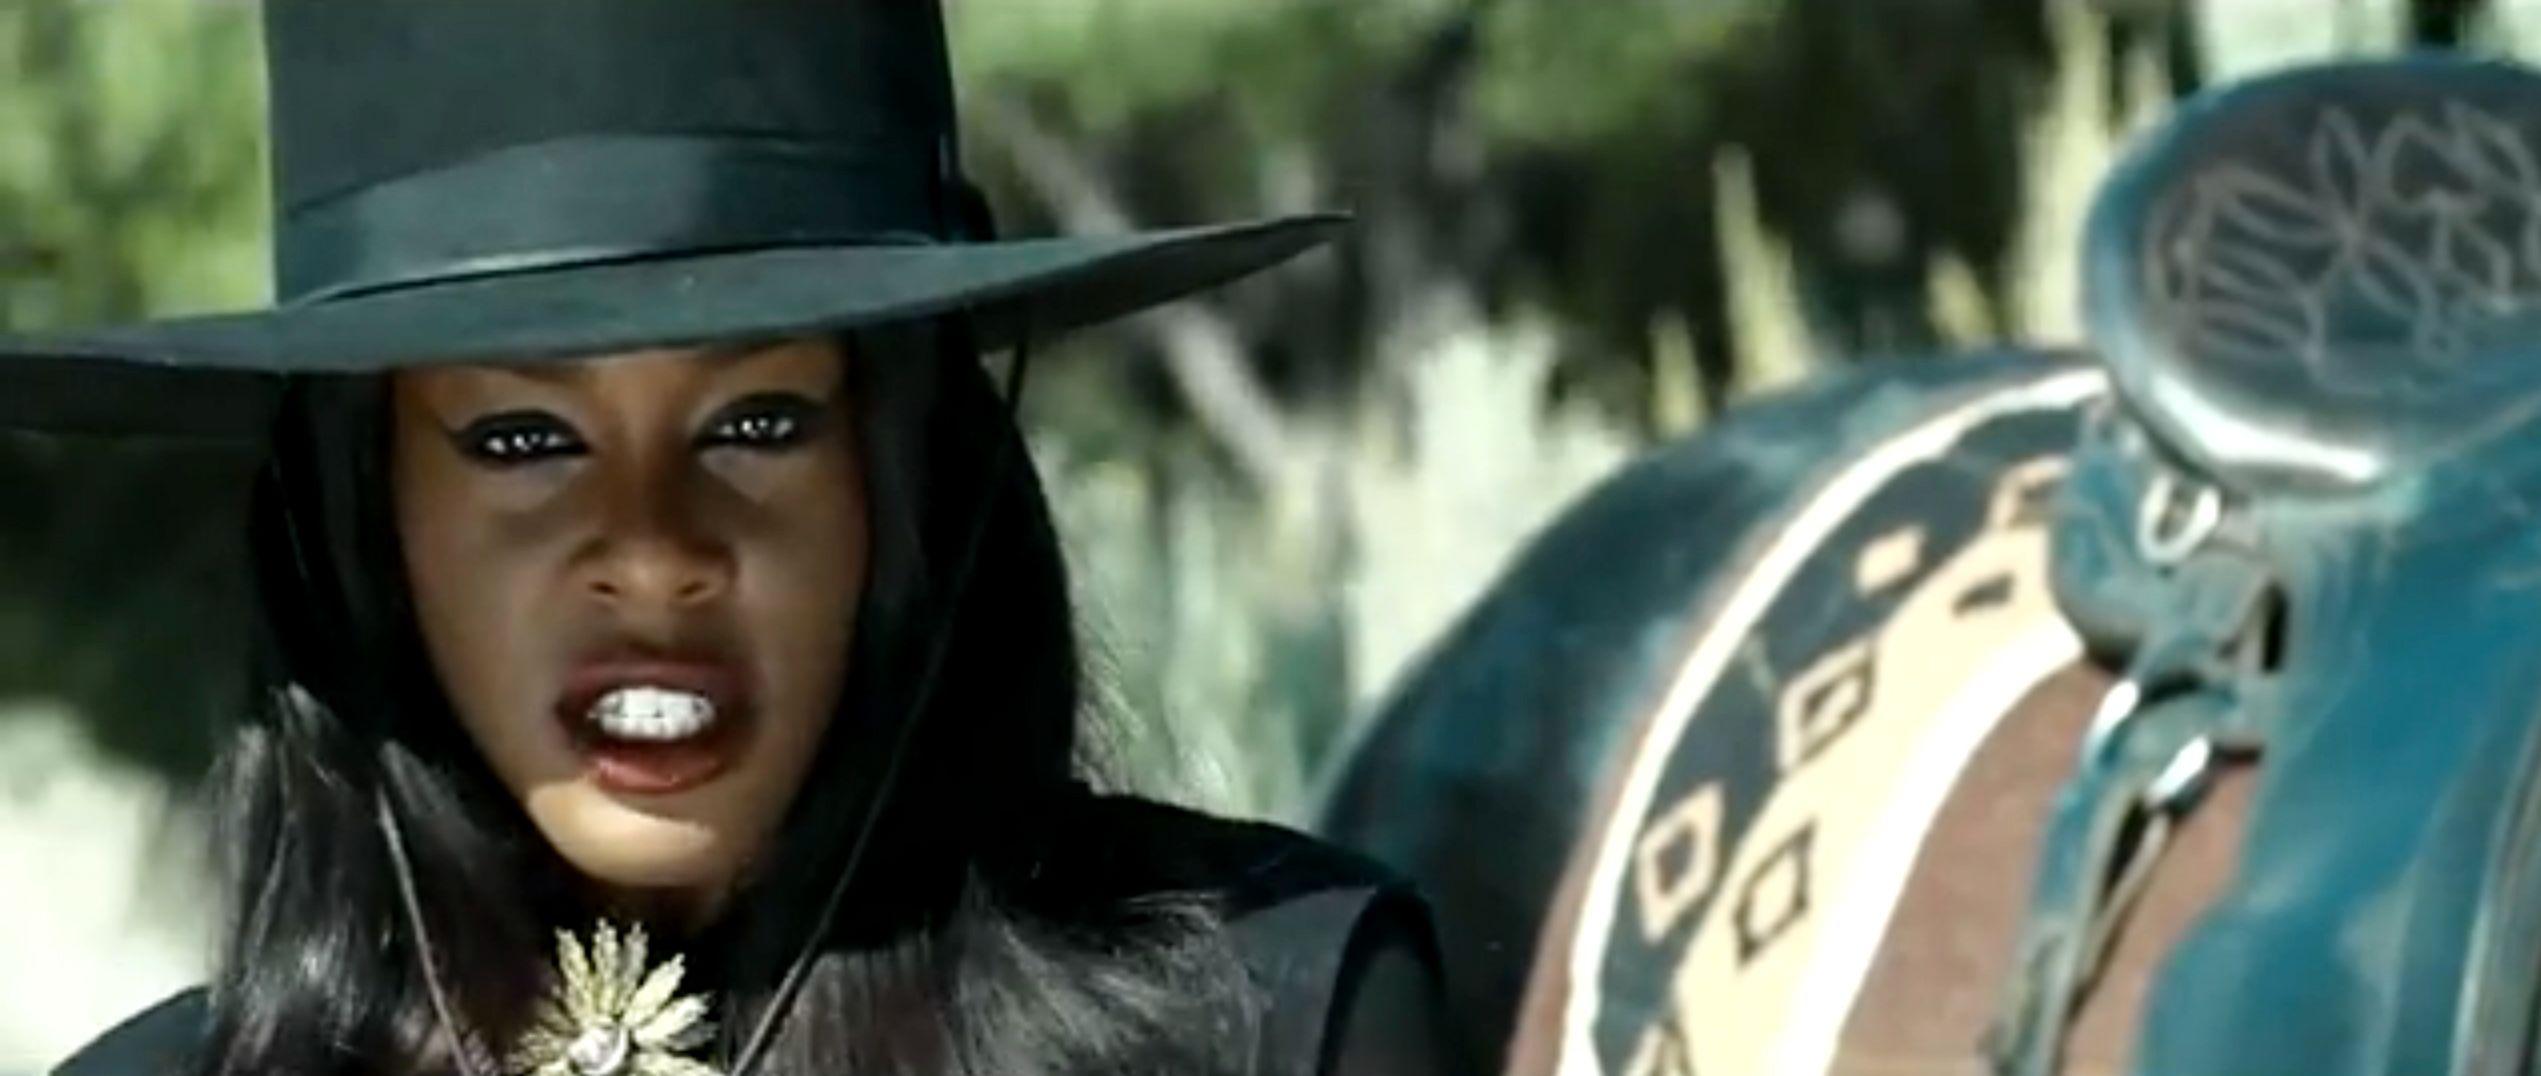 'Liquorice' Video: Azealia Banks Gets Her Gun, Hot Dog, Popsicle